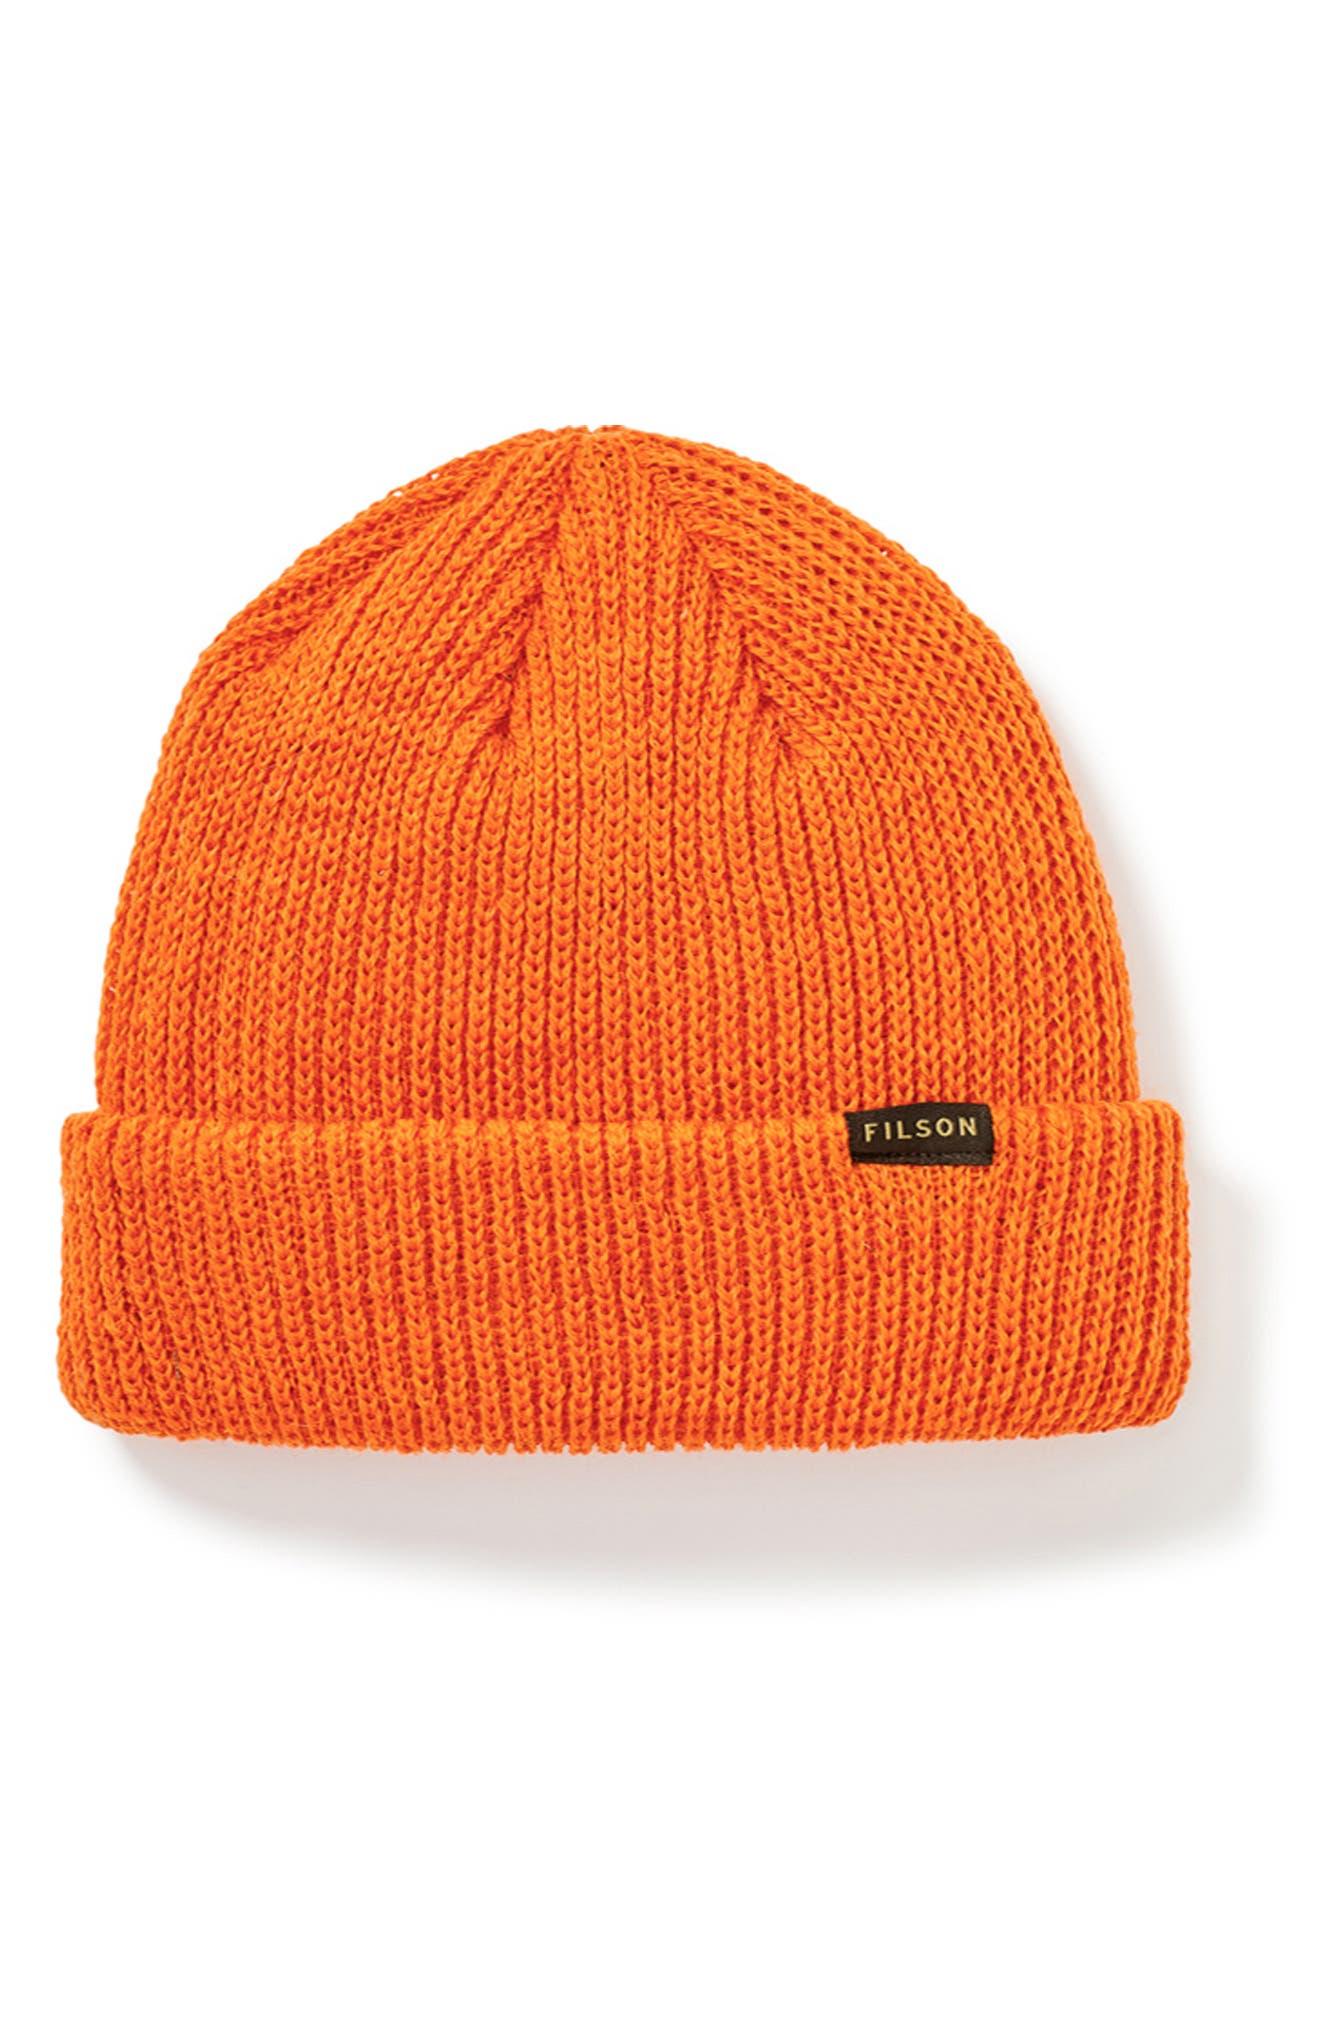 7a76f08f9763 Men s Wool   Wool Blend Beanies  Knit Caps   Winter Hats